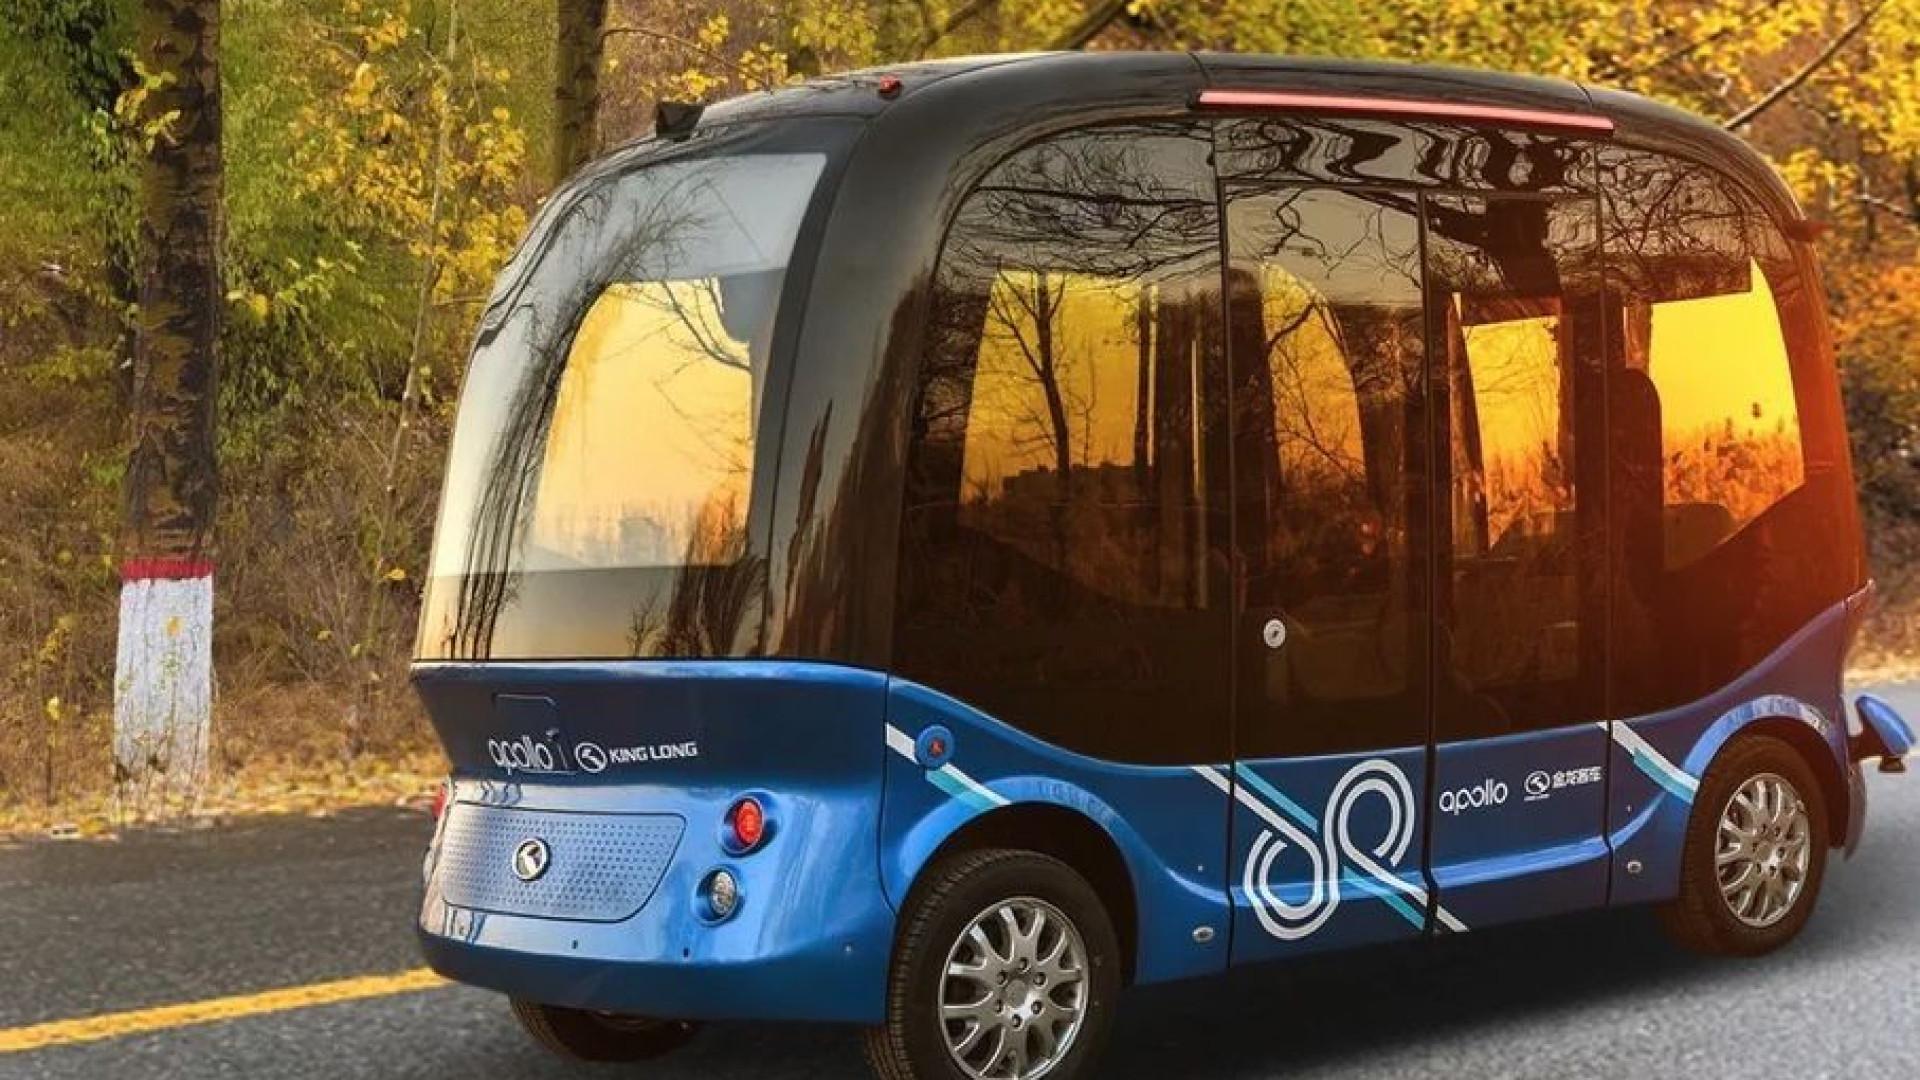 Japão terá ônibus autônomos já em 2019